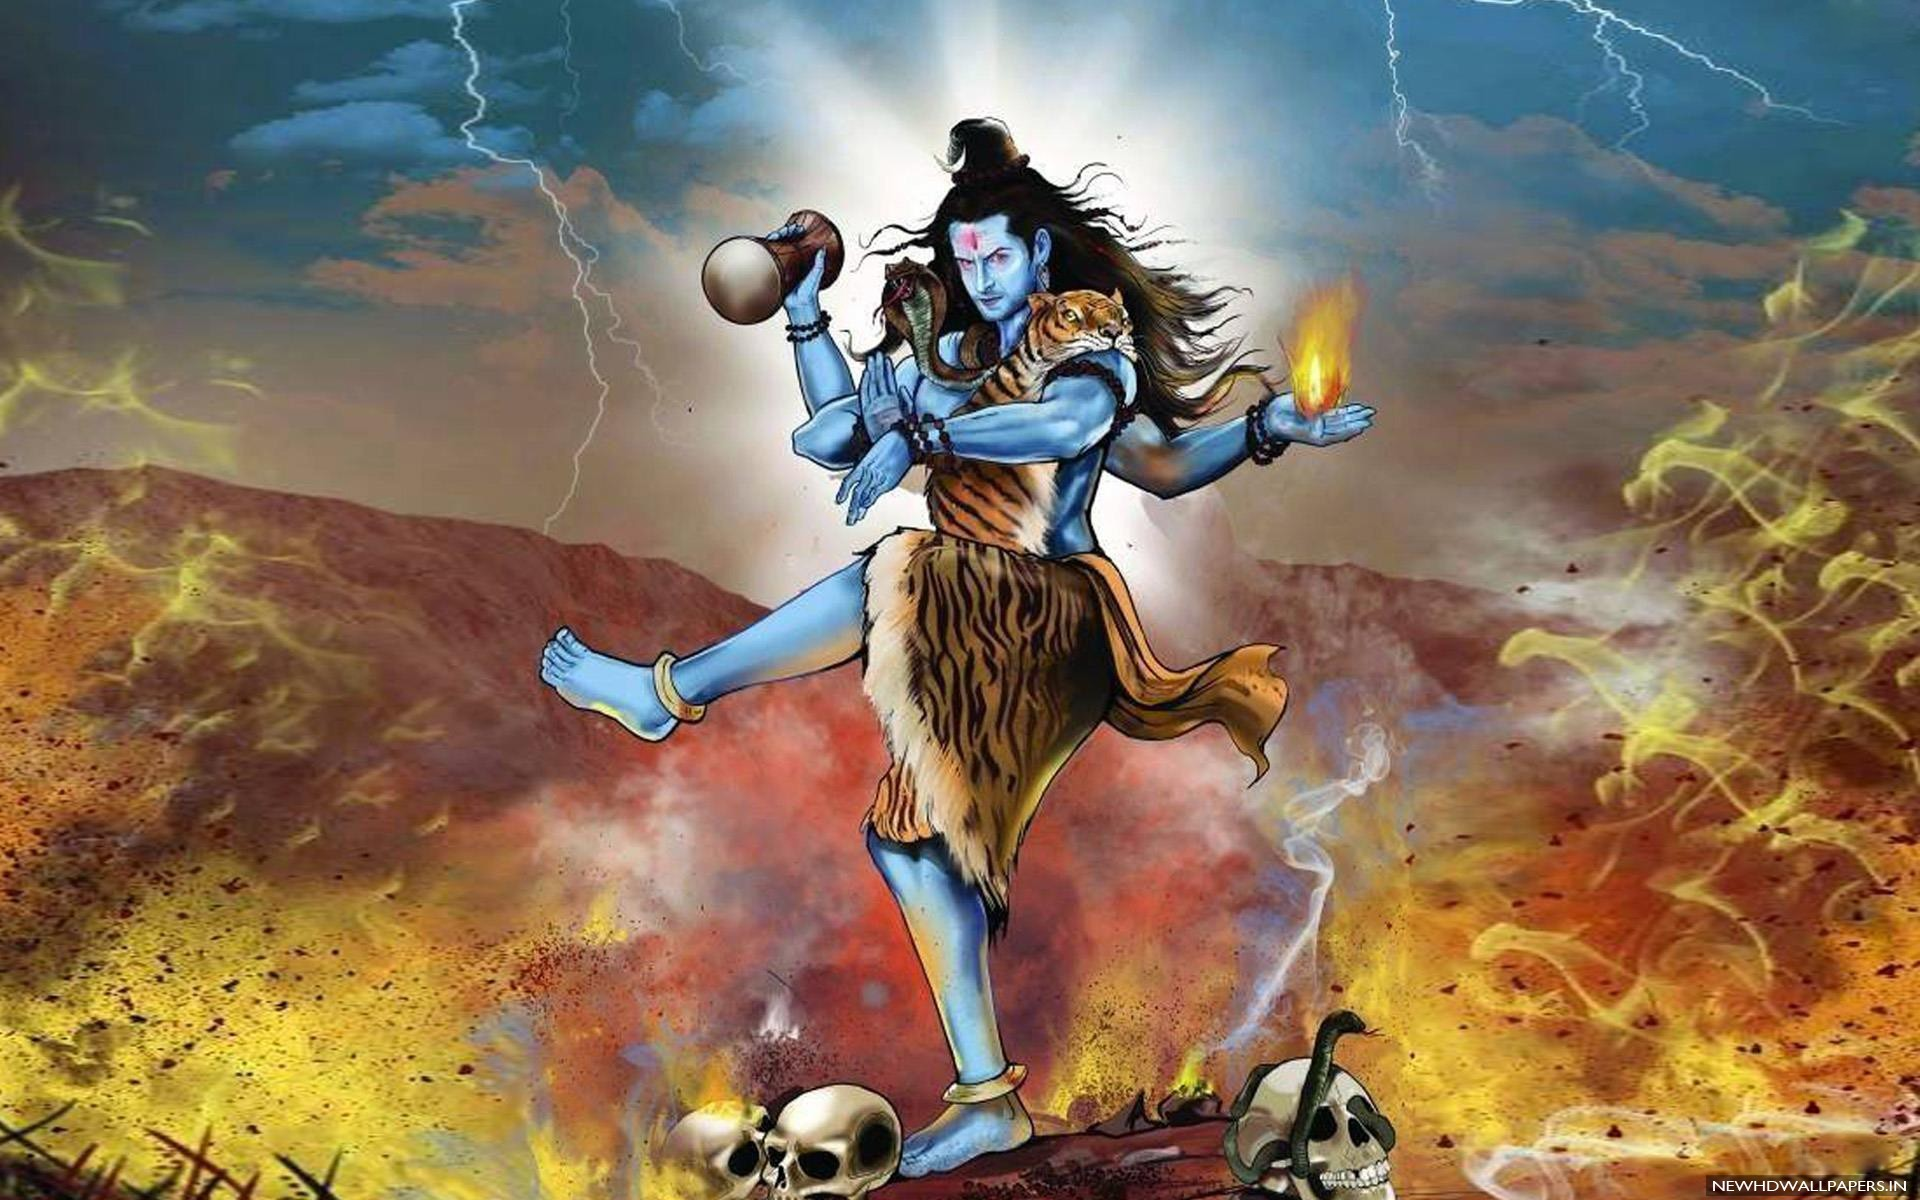 Hd wallpaper bholenath - Lord Shiva Wallpapers Hd Wallpapersafari